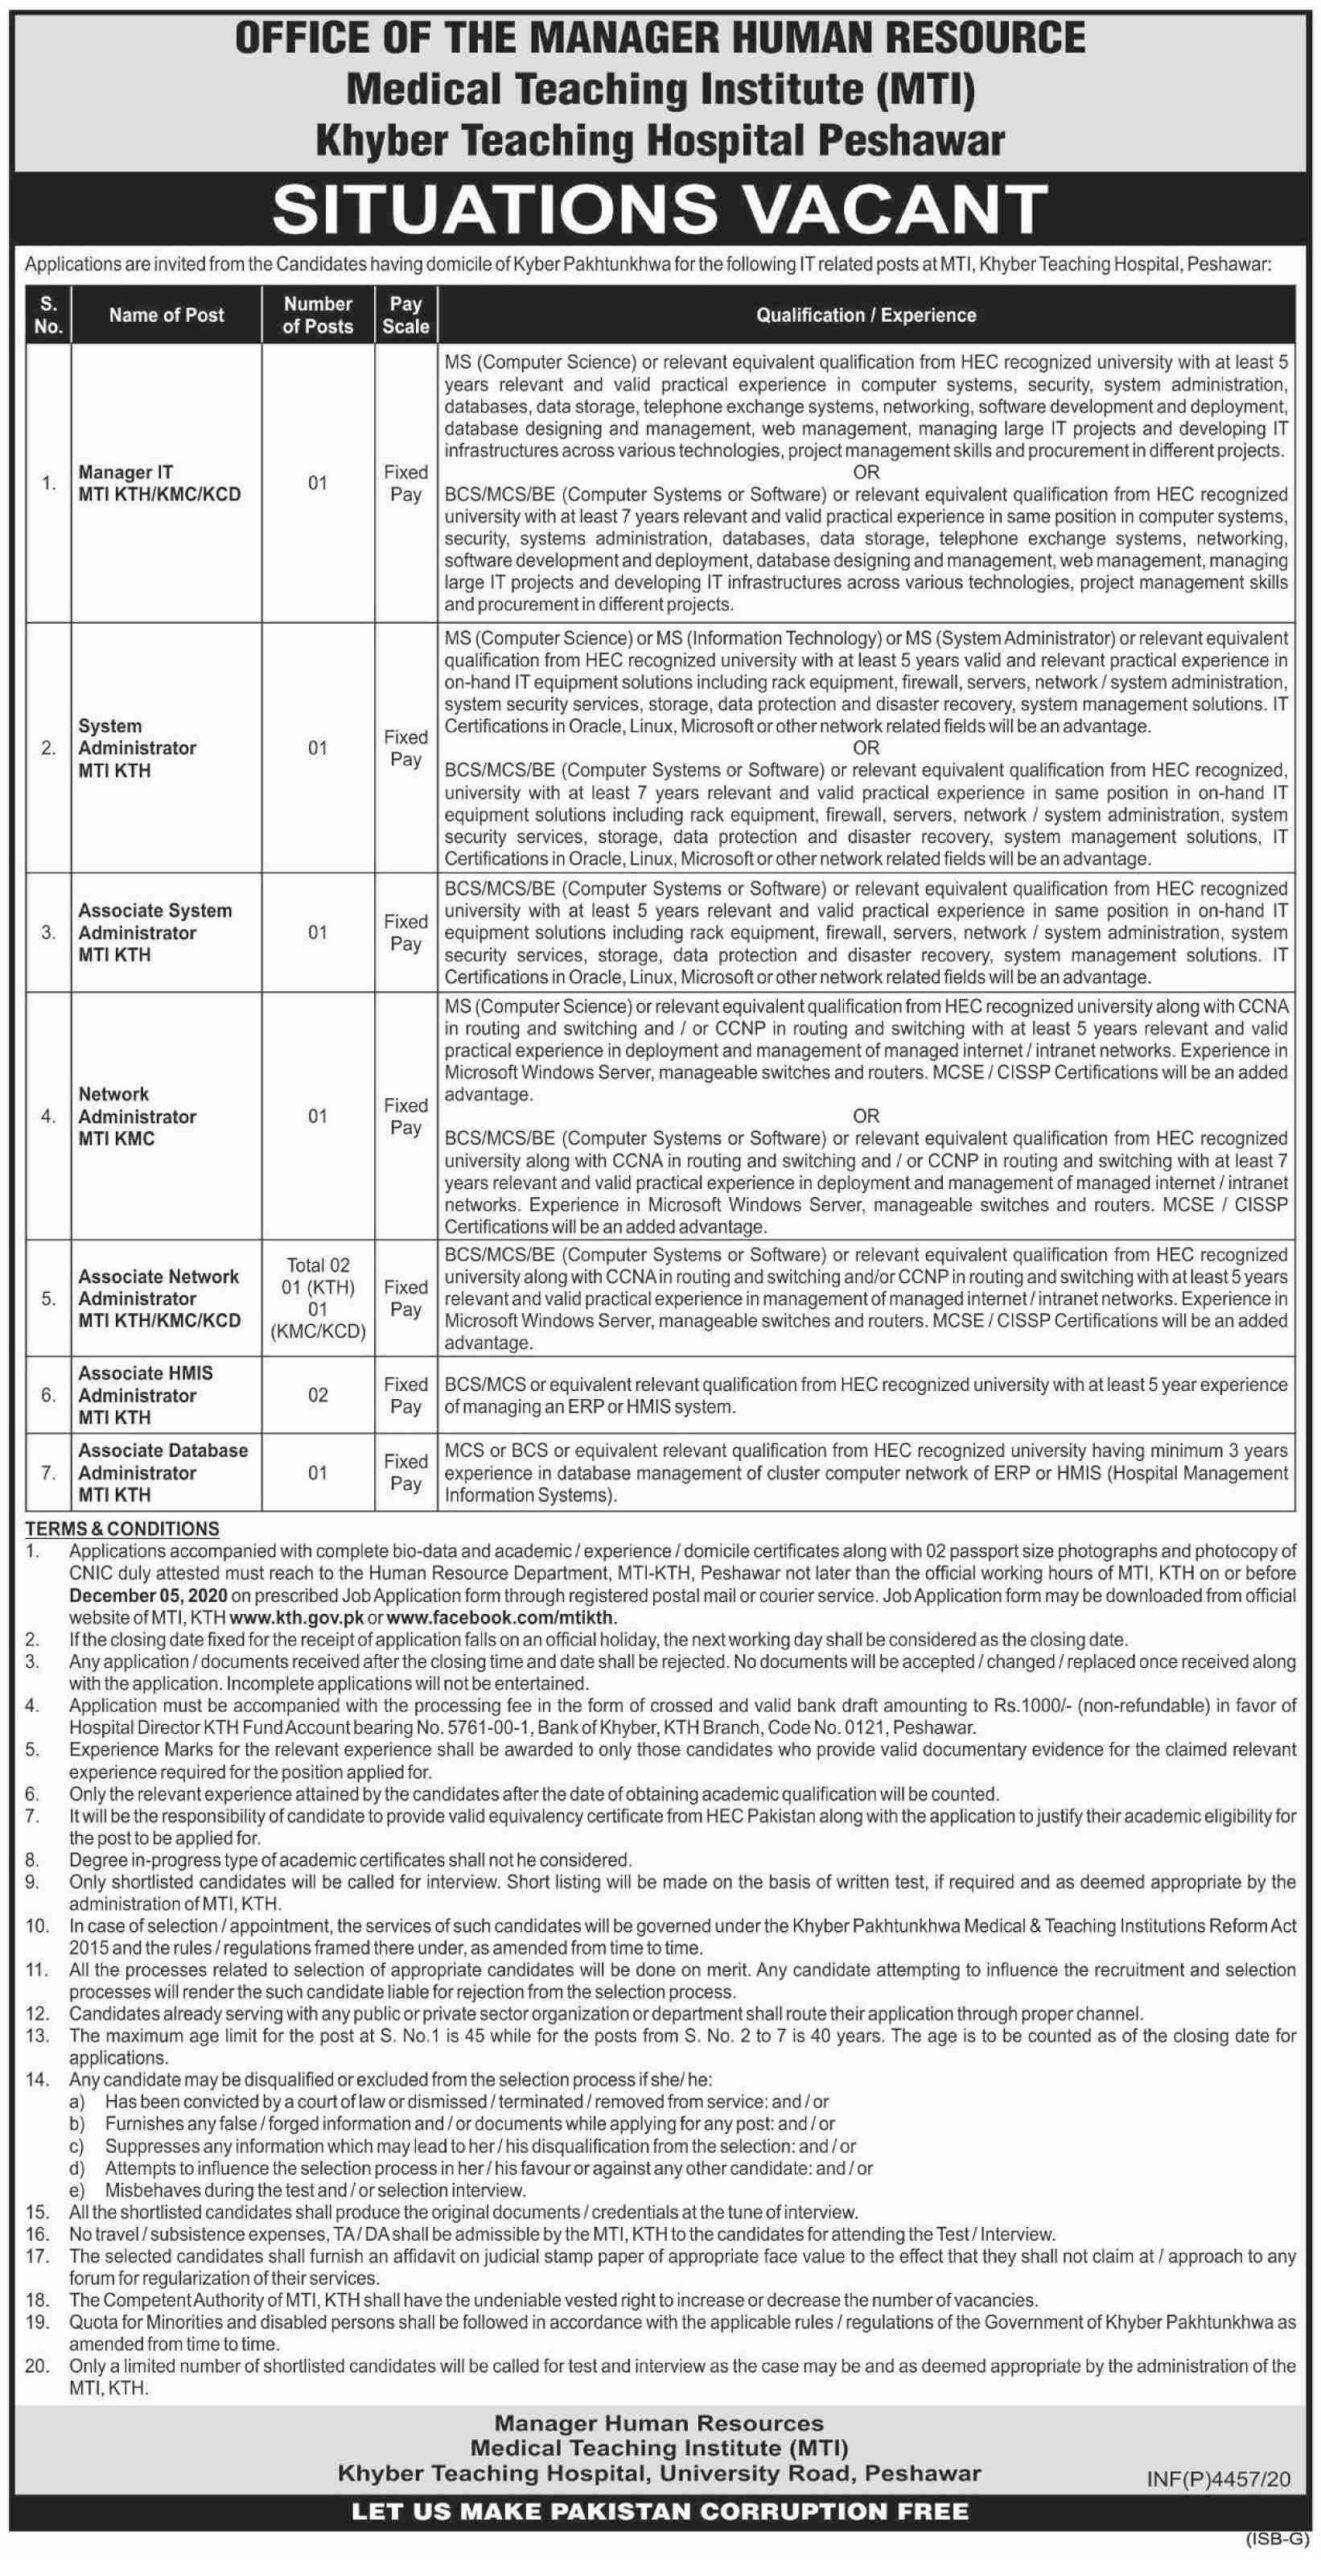 Medical Teaching Institute (MTI) Khyber Teaching Hospital Peshawar Jobs 2020 for Manager IT